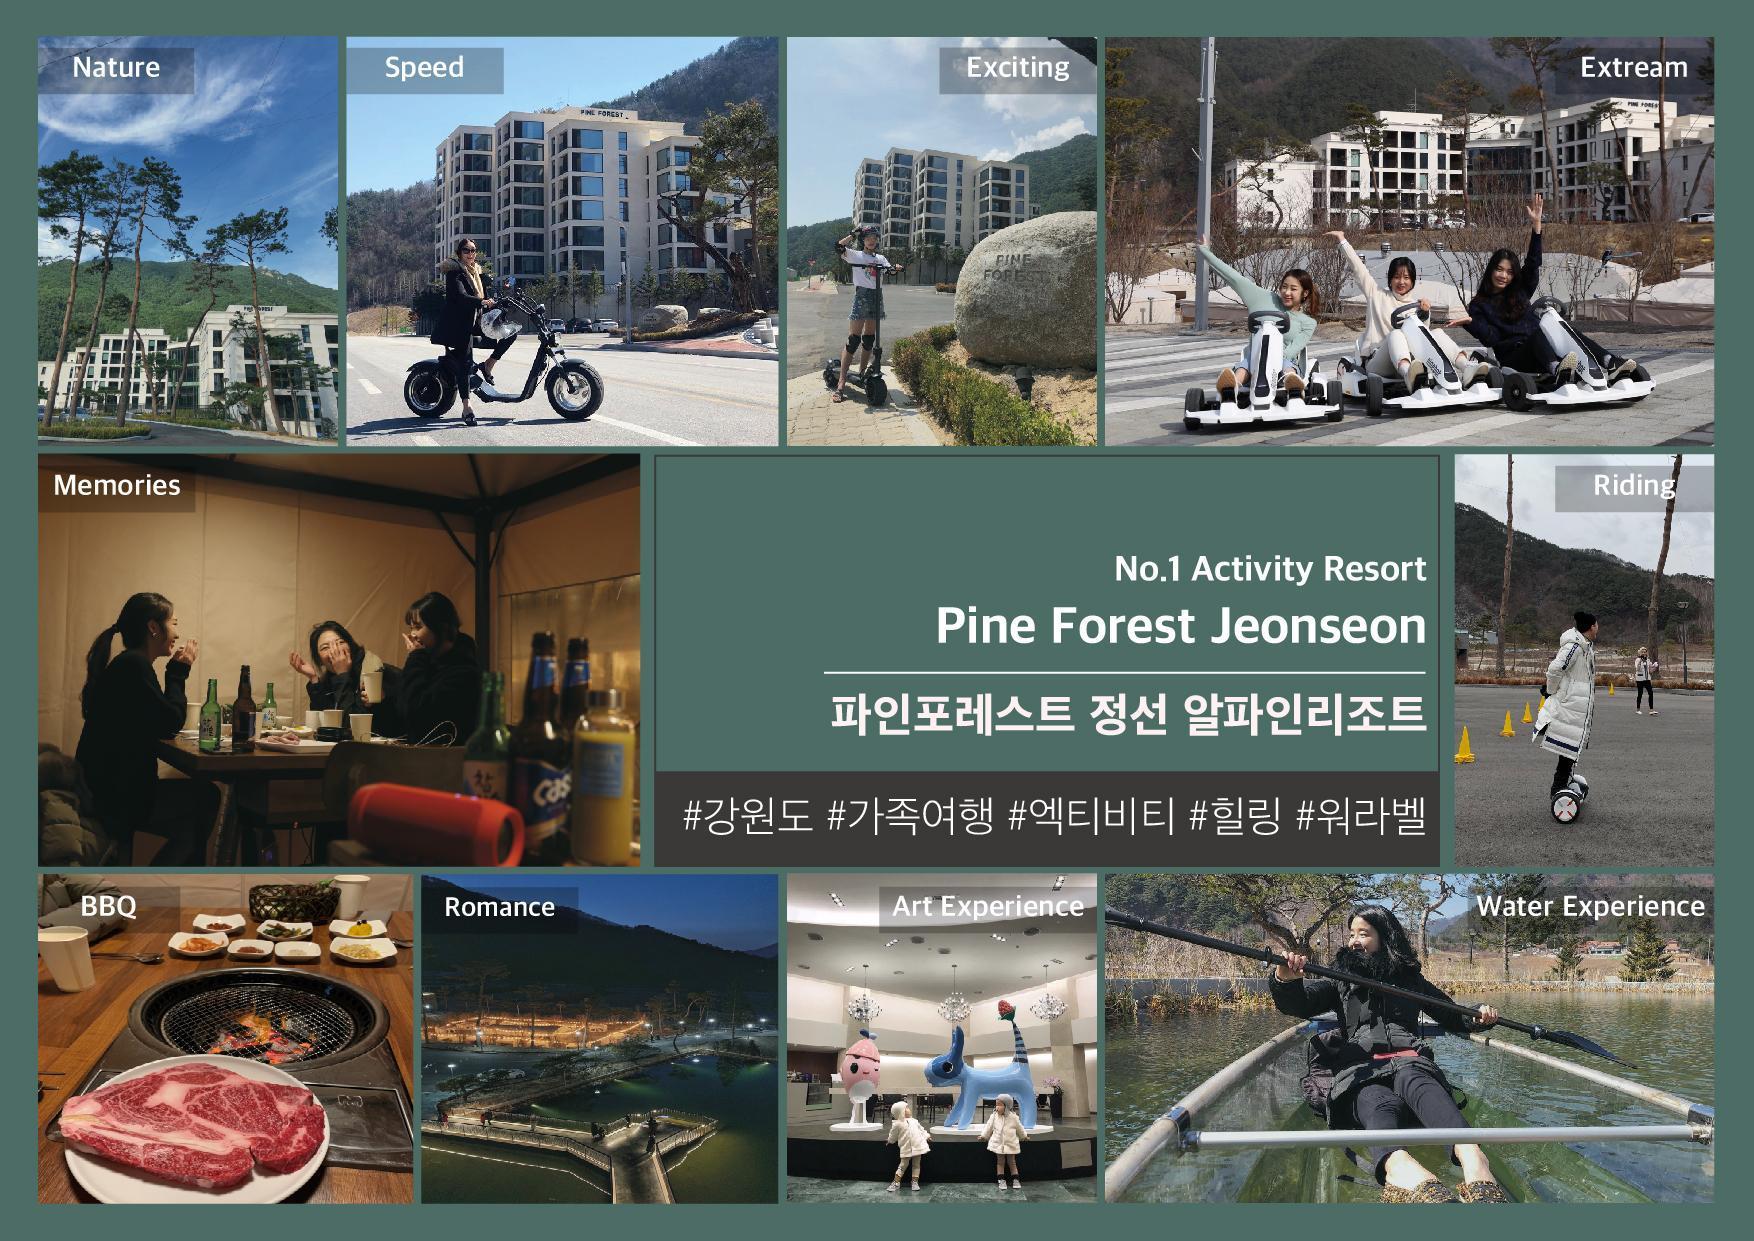 Pine Forest Jeongseon Alpine Resort, Jeongseon